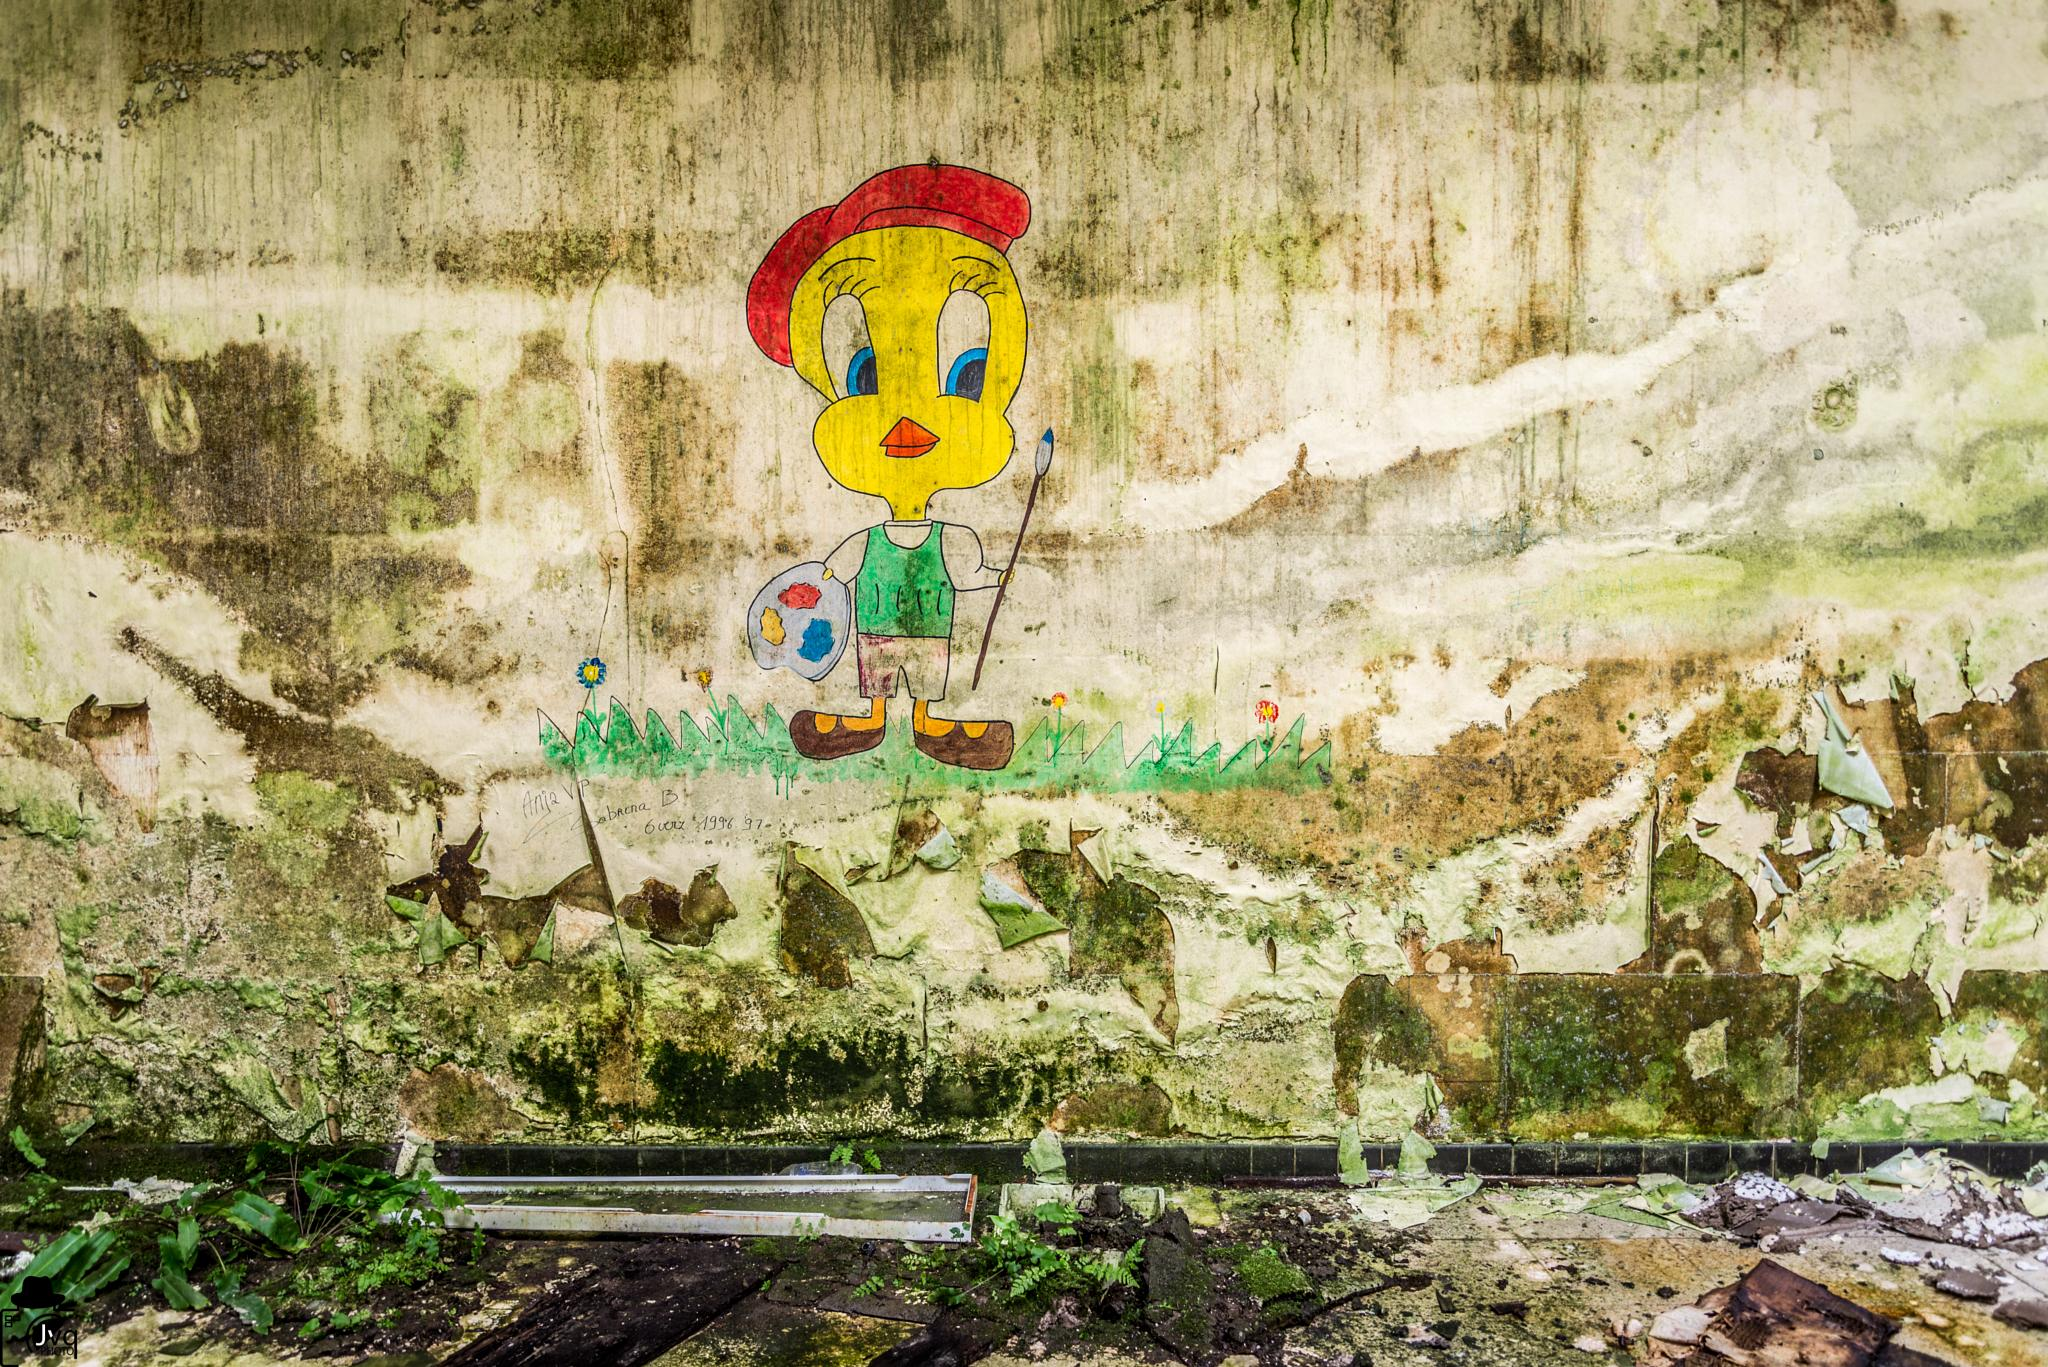 Titi de a Jungle School by Le Baroudeur